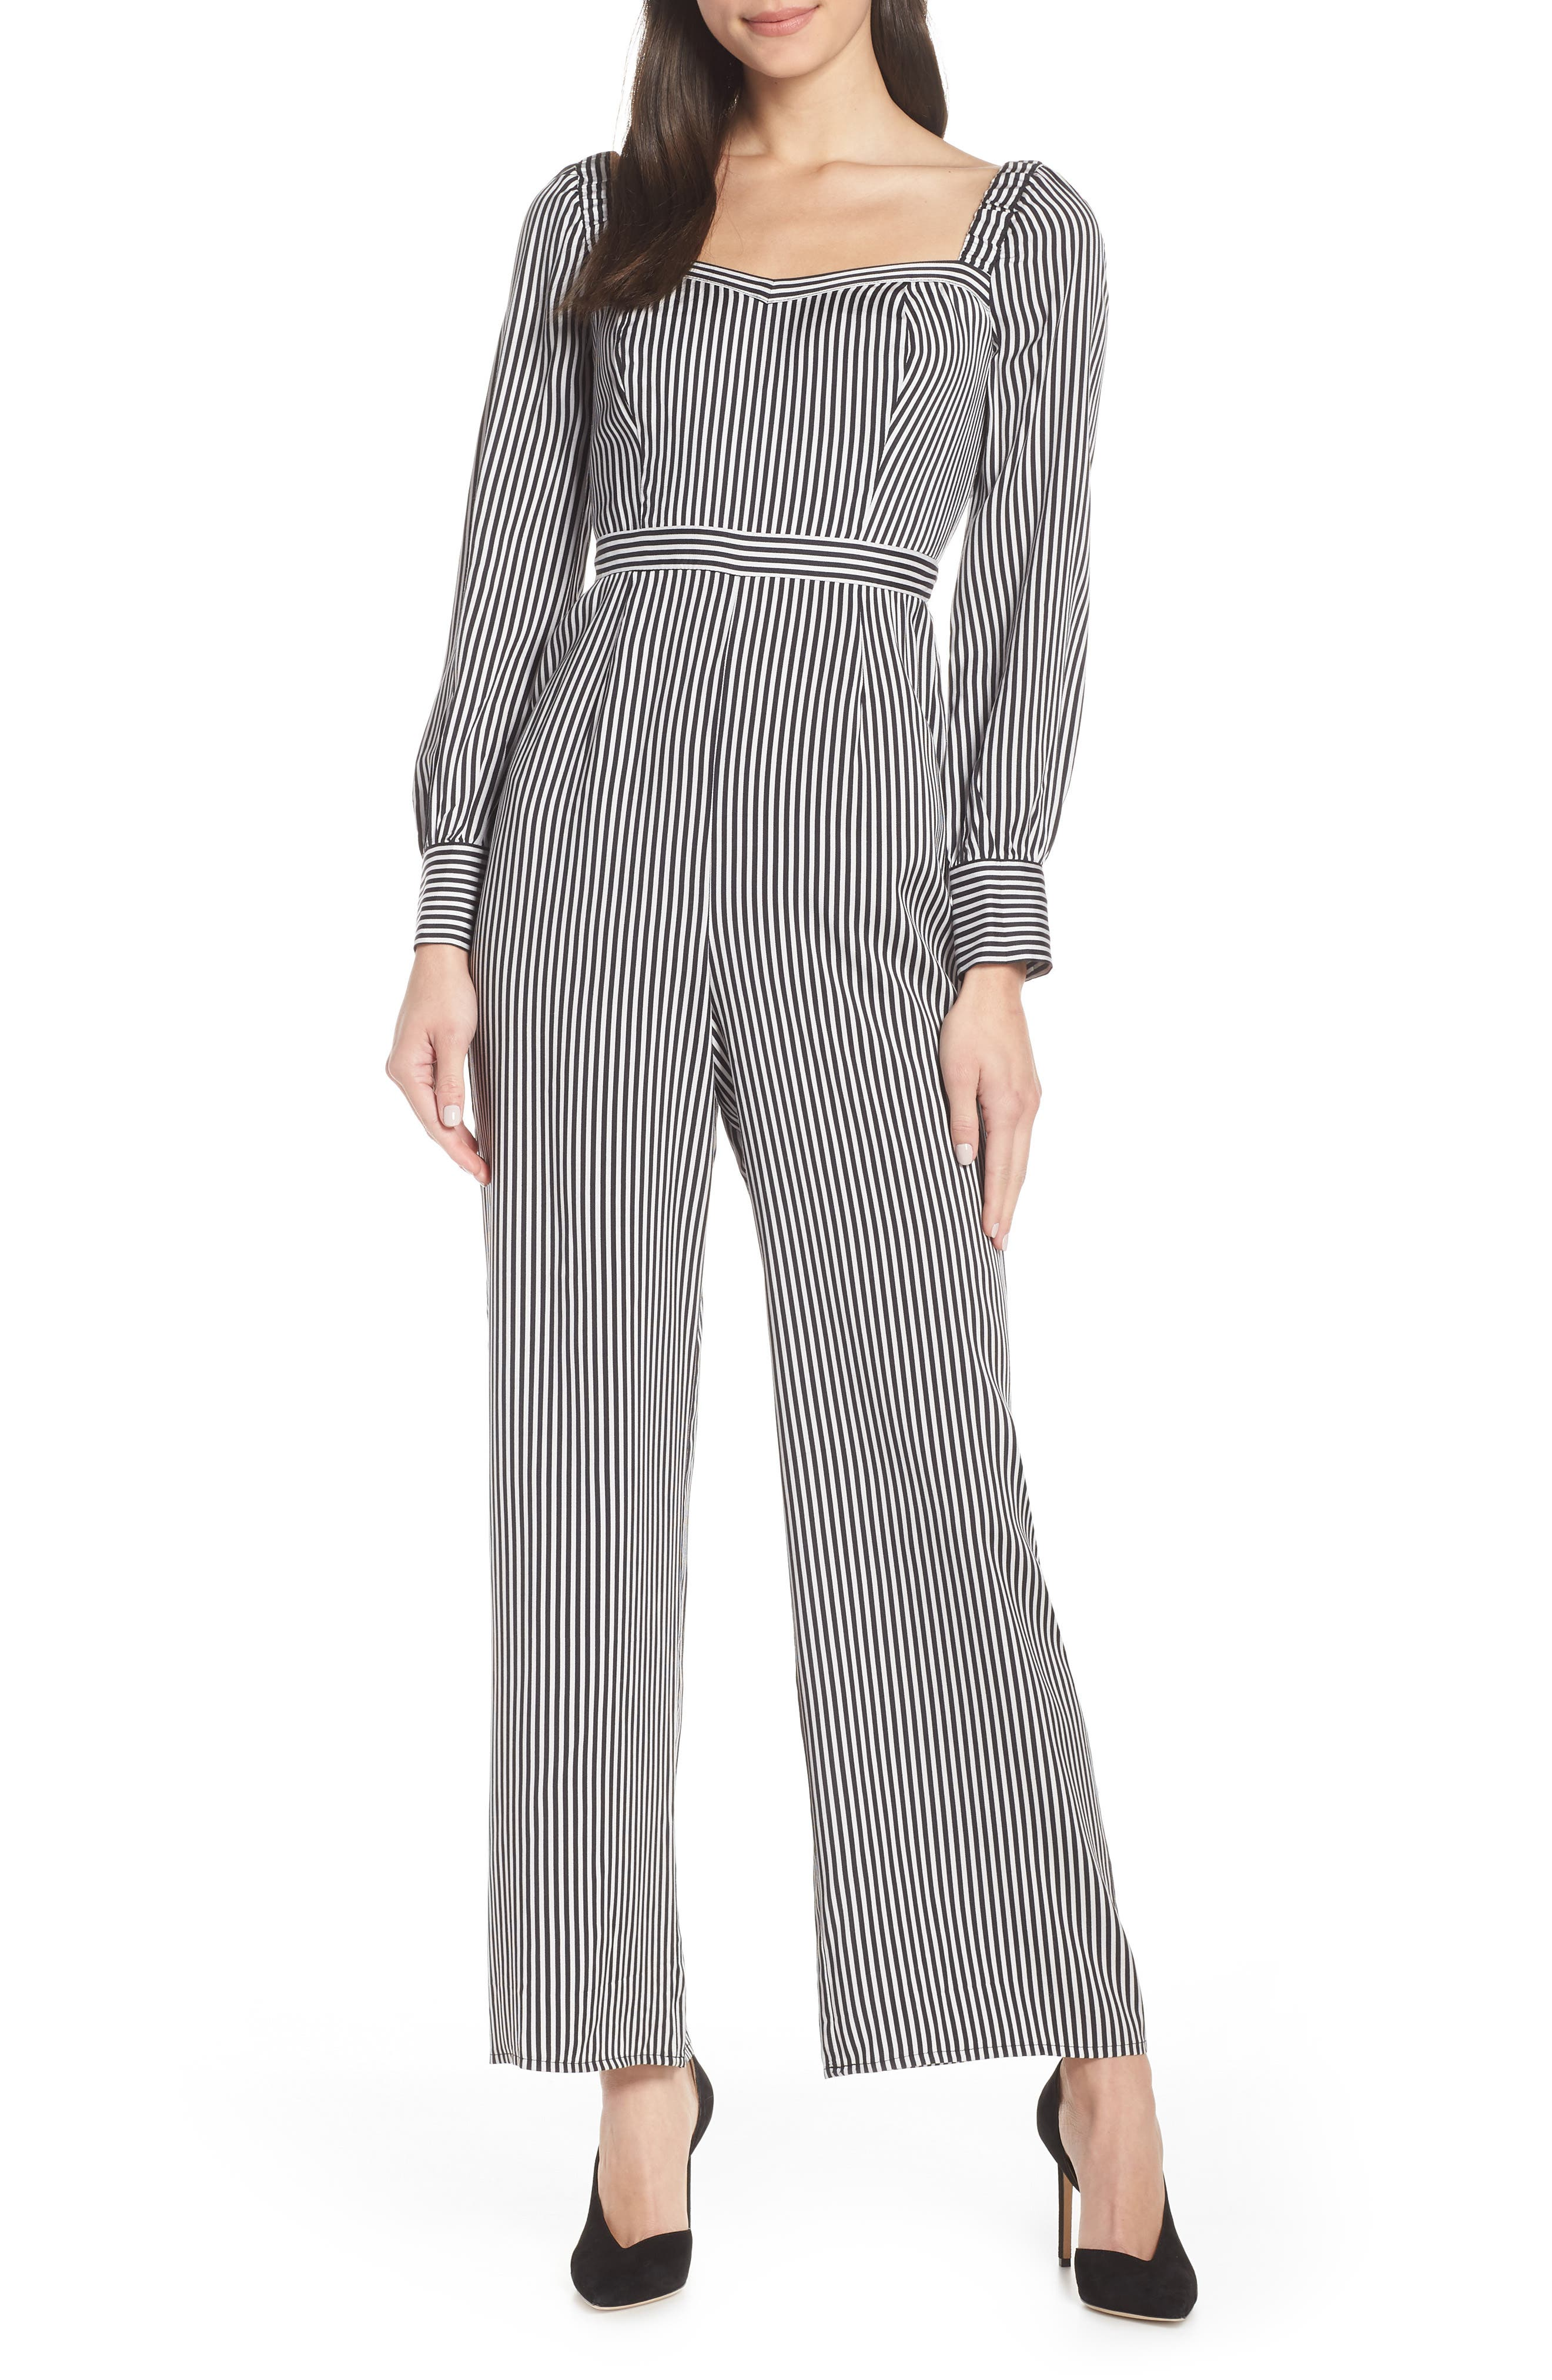 ALI & JAY Retro Stripe Jumpsuit, Main, color, BLACK/ WHITE